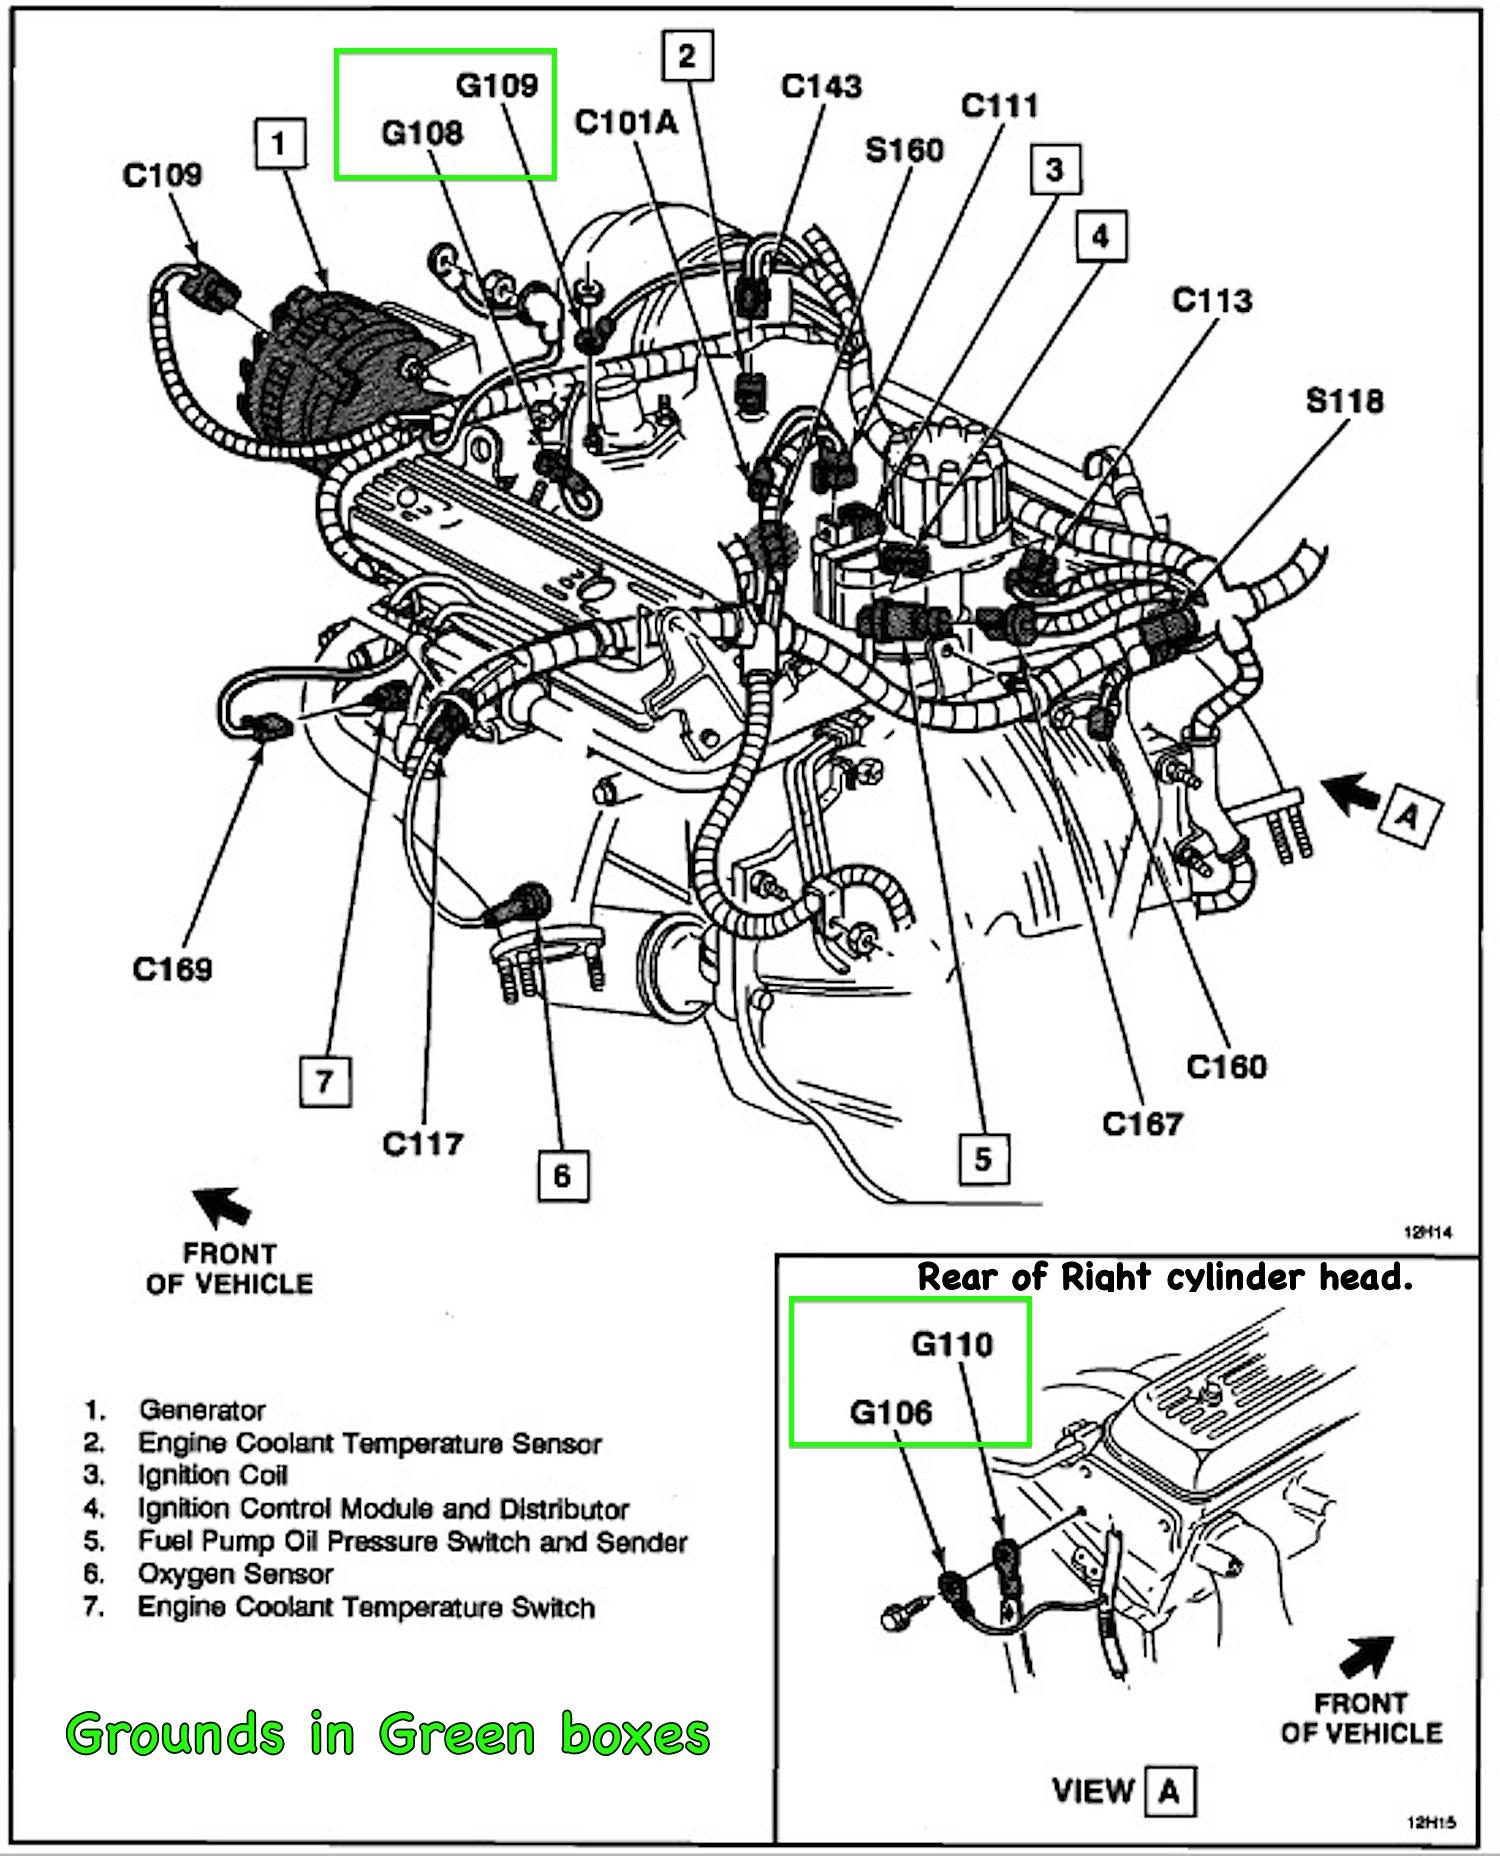 92 Gm Tbi Wiring Harness Diagram | Manual E-Books - Tbi Wiring Harness Diagram